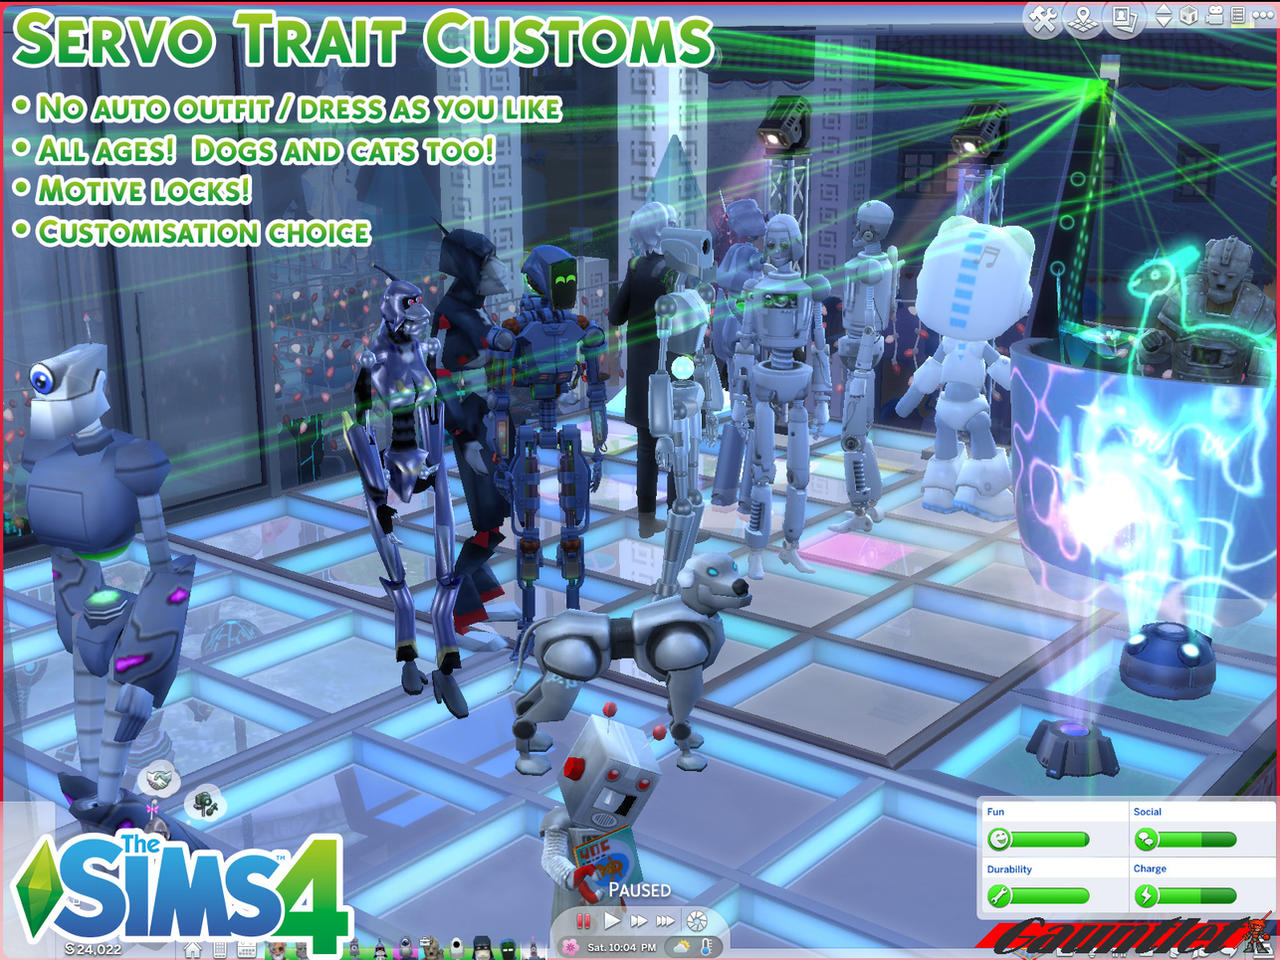 Sims4 Servo Trait Customs By Gauntlet101010 On Deviantart